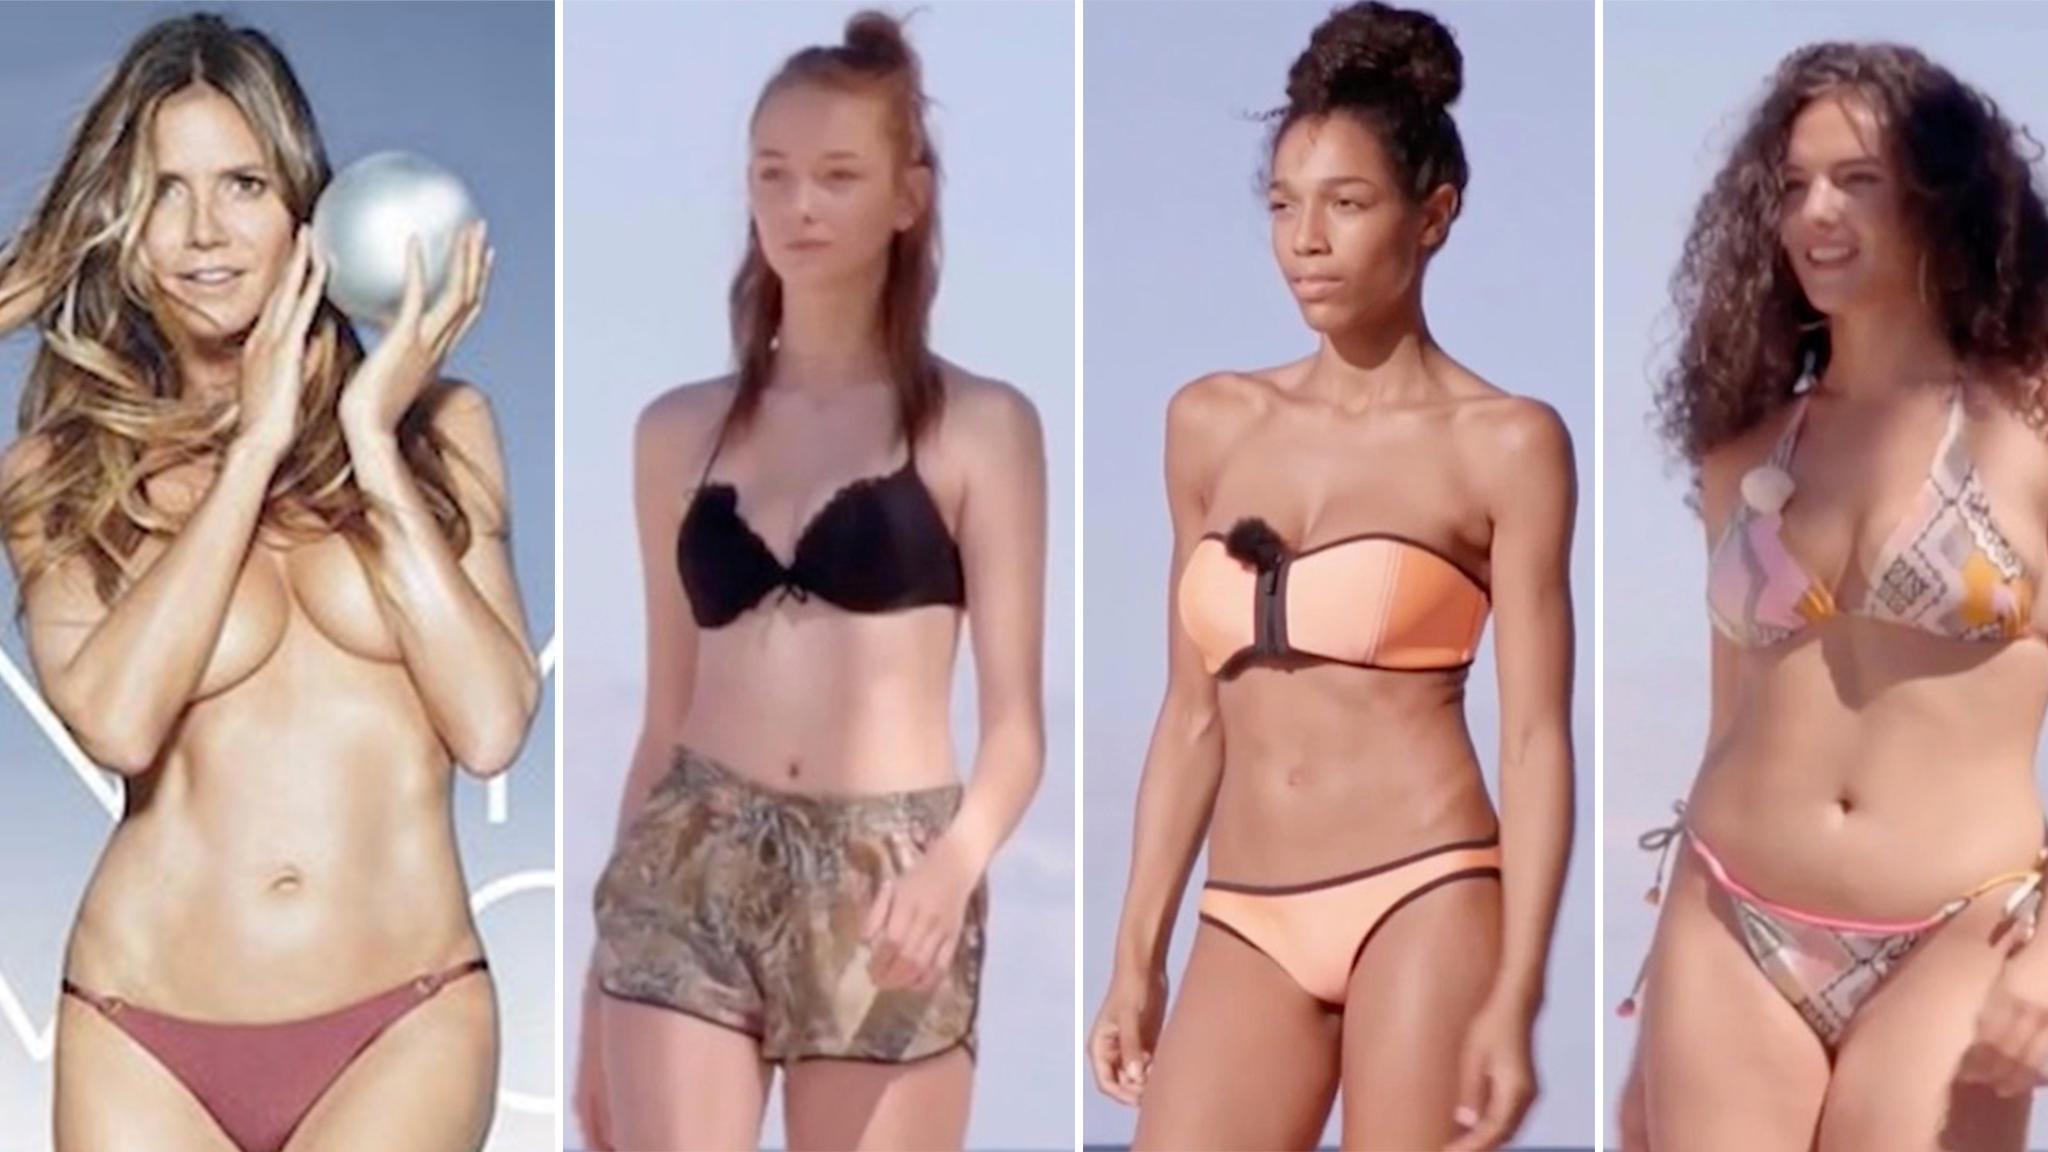 46dcf0d9ac GNTM von Heidi Klum  Penis-Panik wegen nackter Male-Models